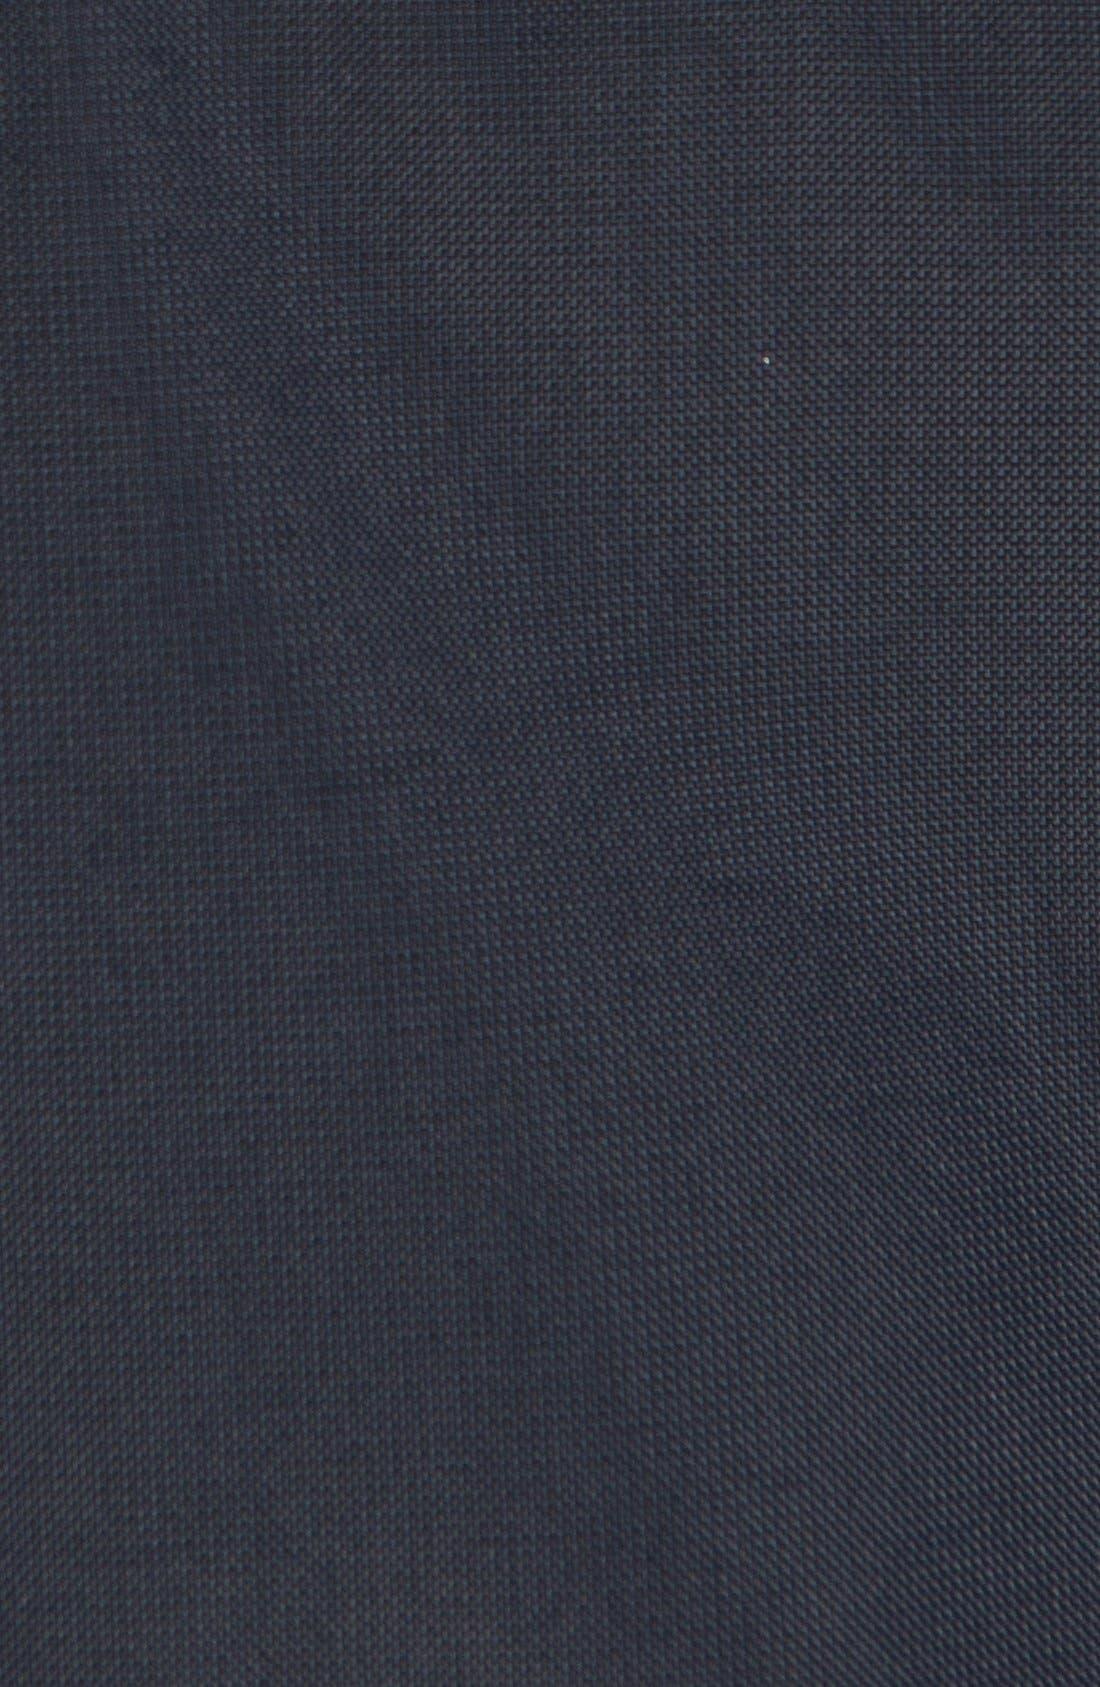 Alternate Image 3  - Zegna Sport Waterproof Jacket